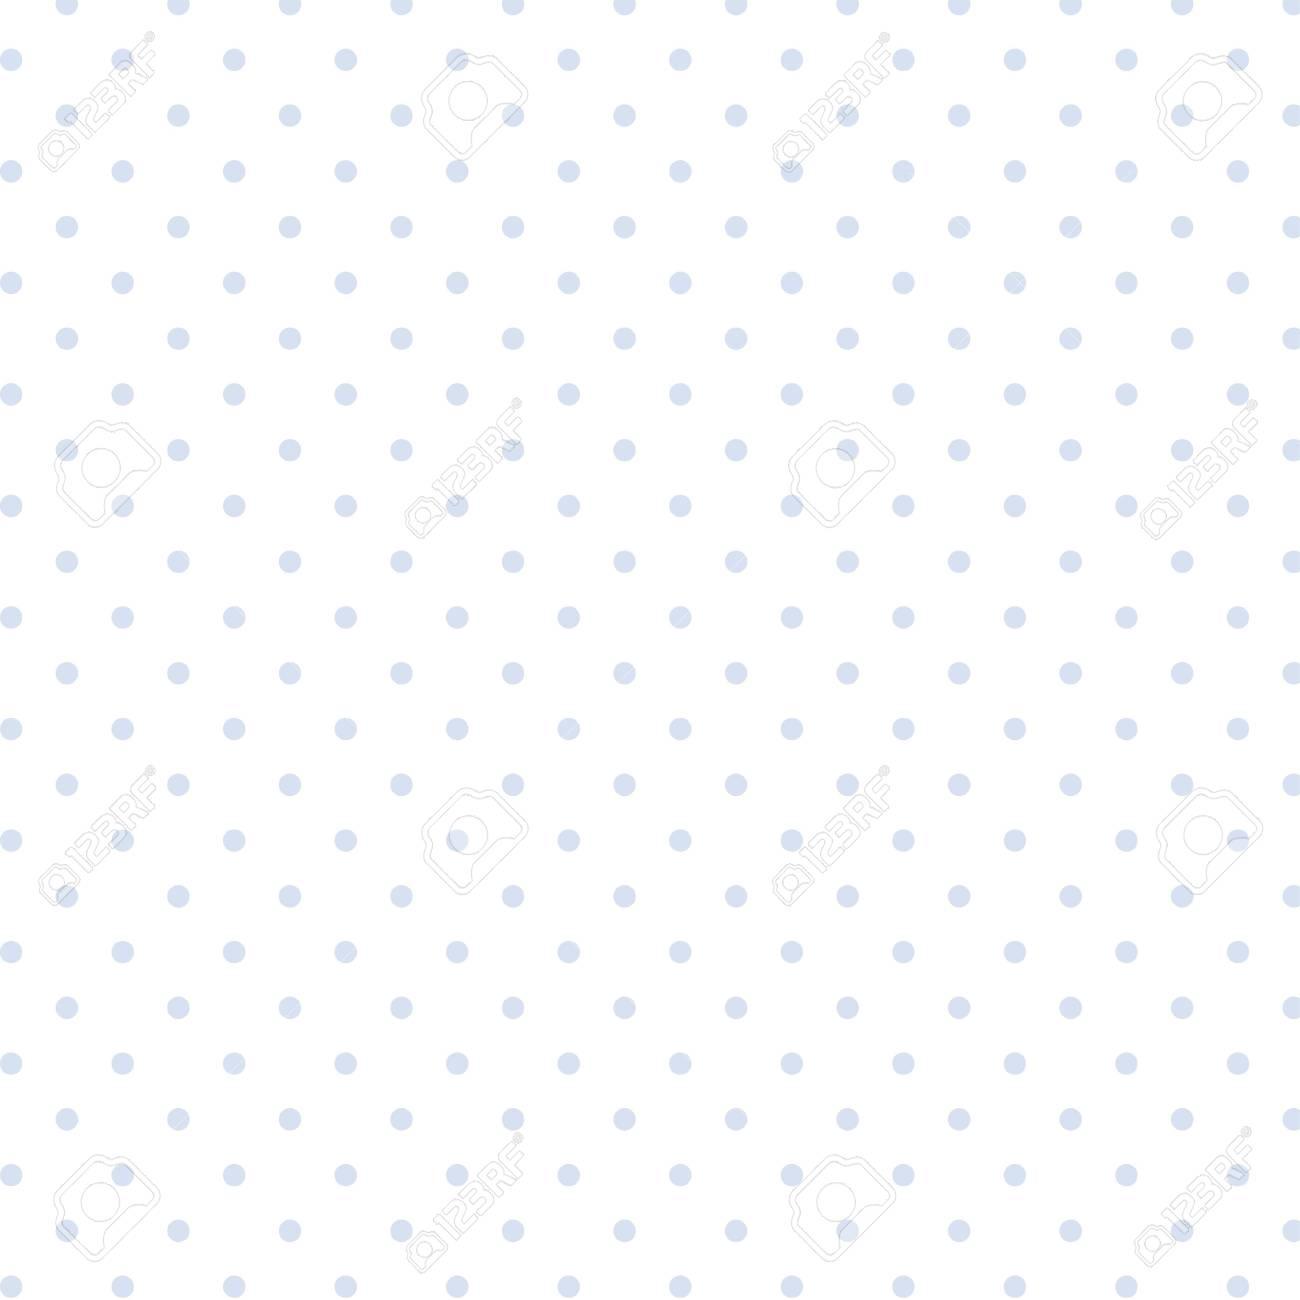 Polka dot background pattern - 114708514